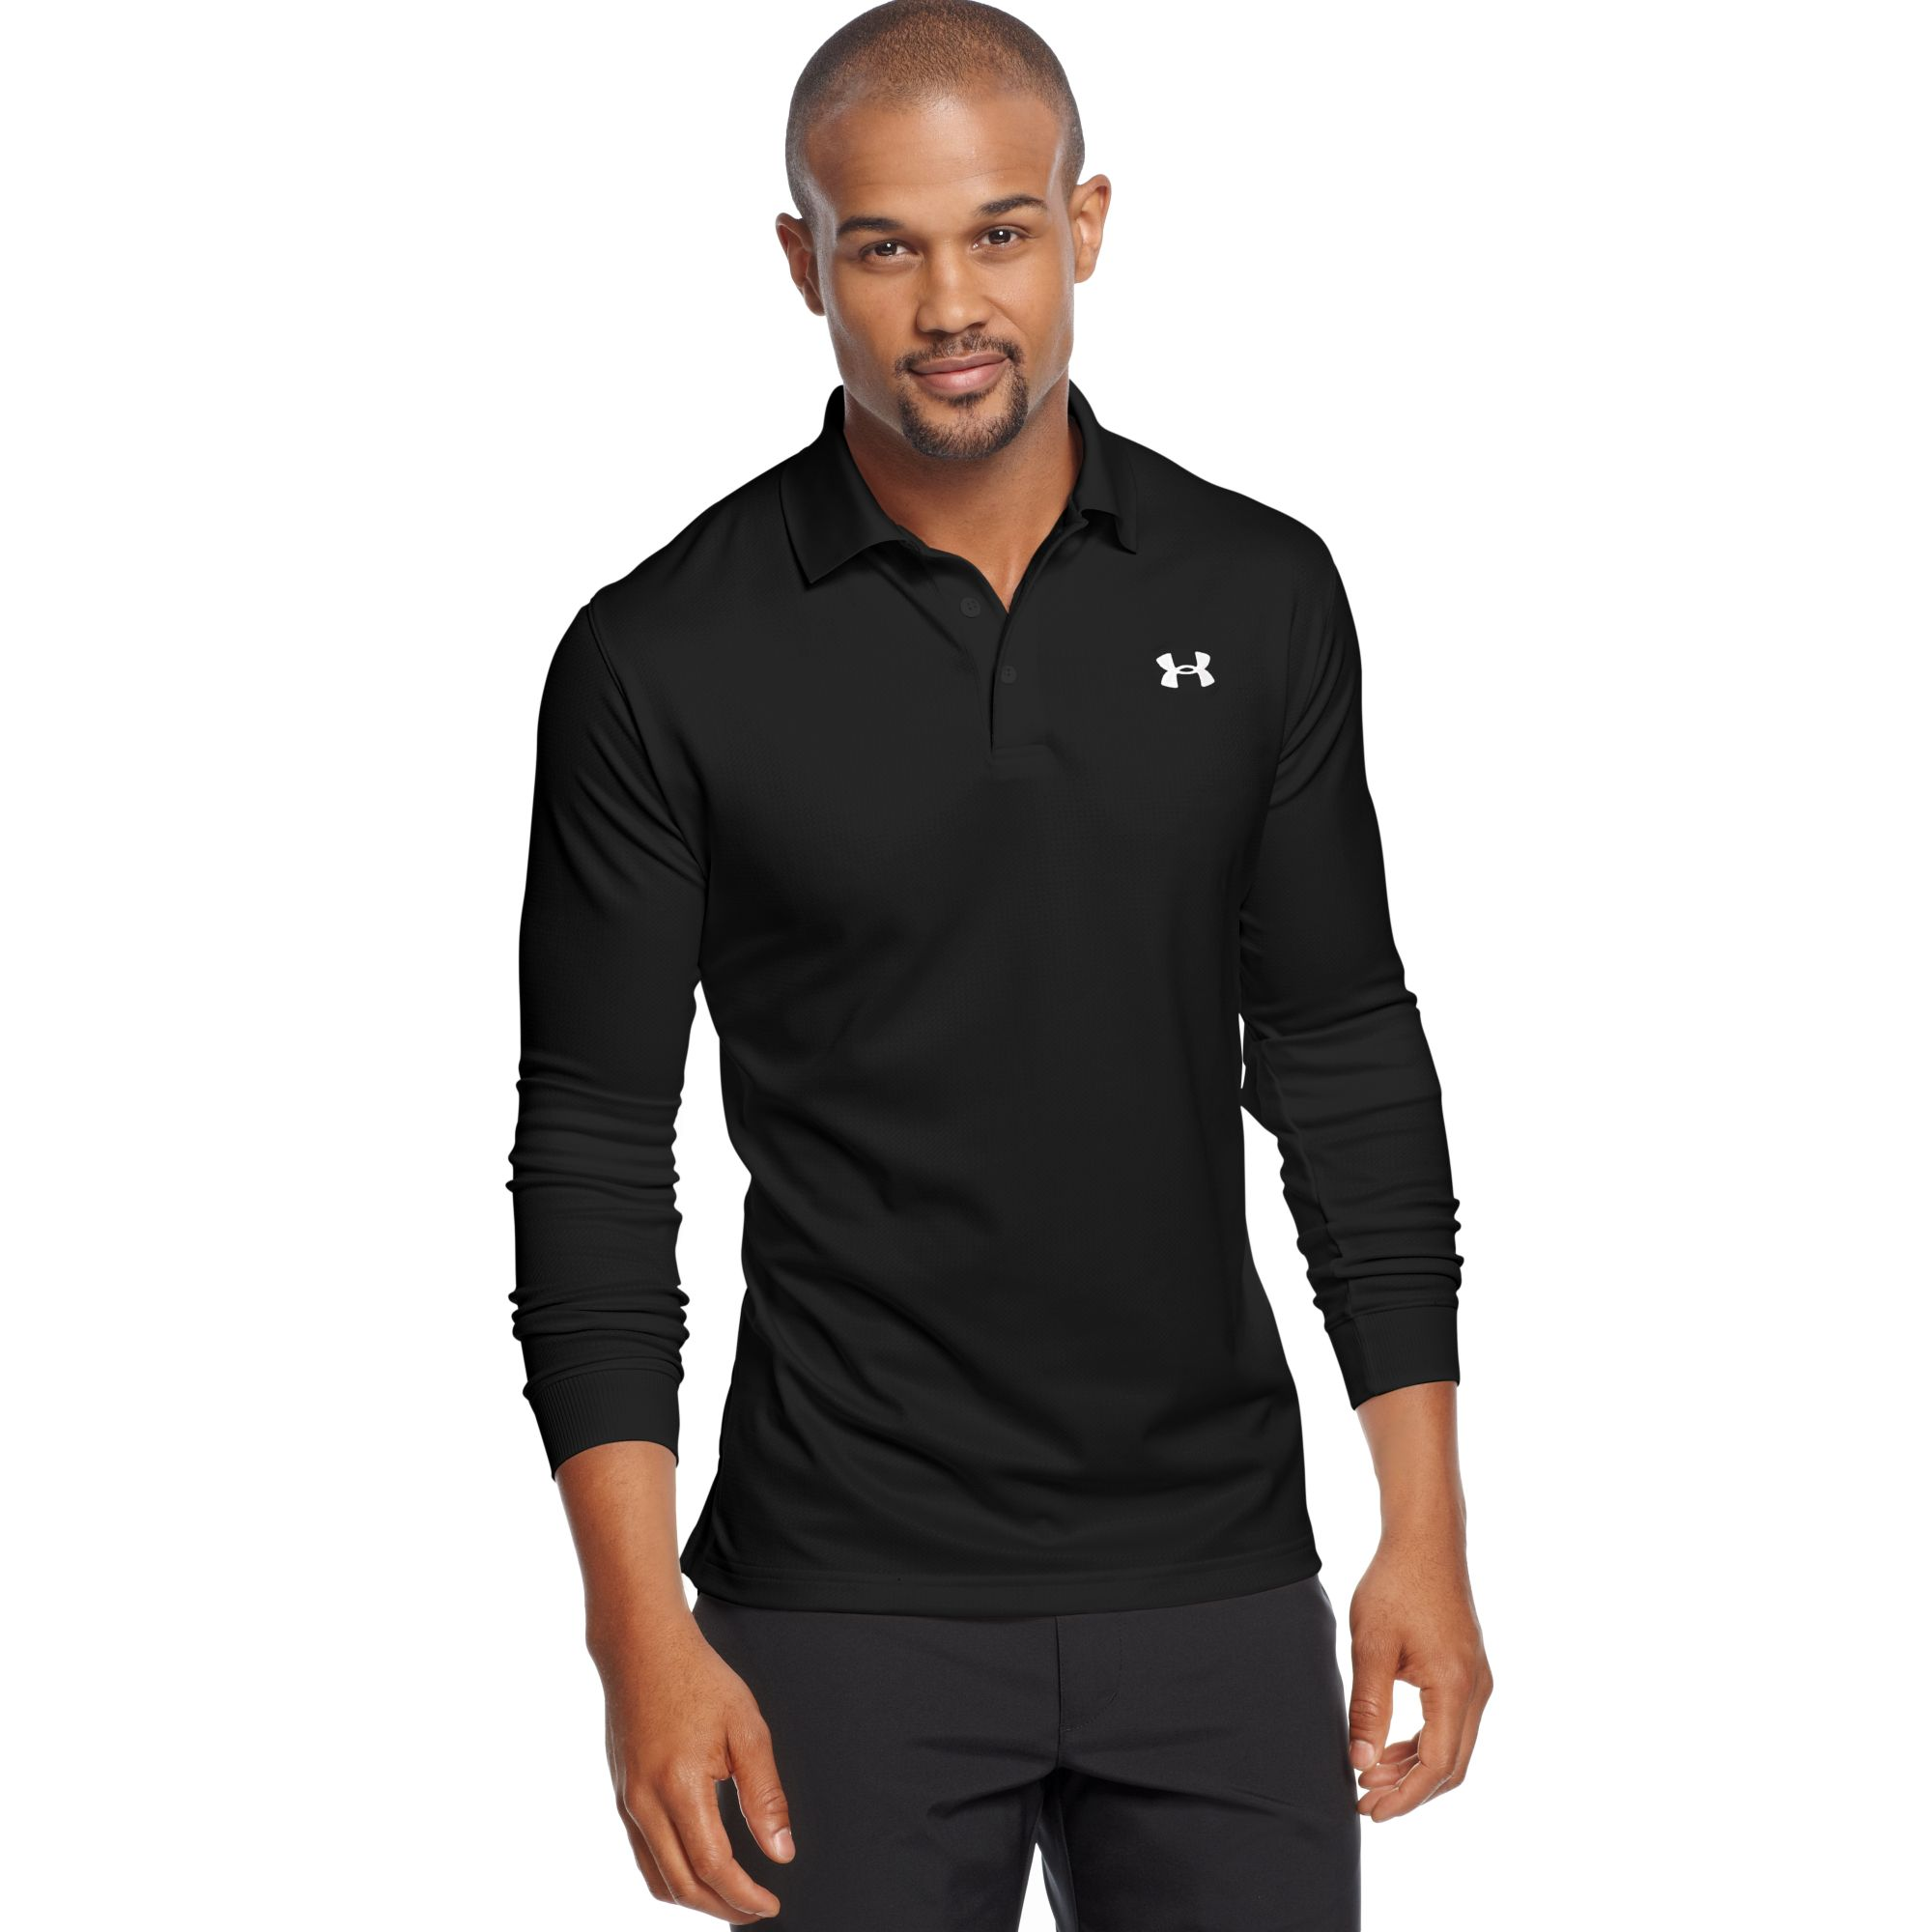 897ef2c8 Under Armor Shirt Long Sleeve